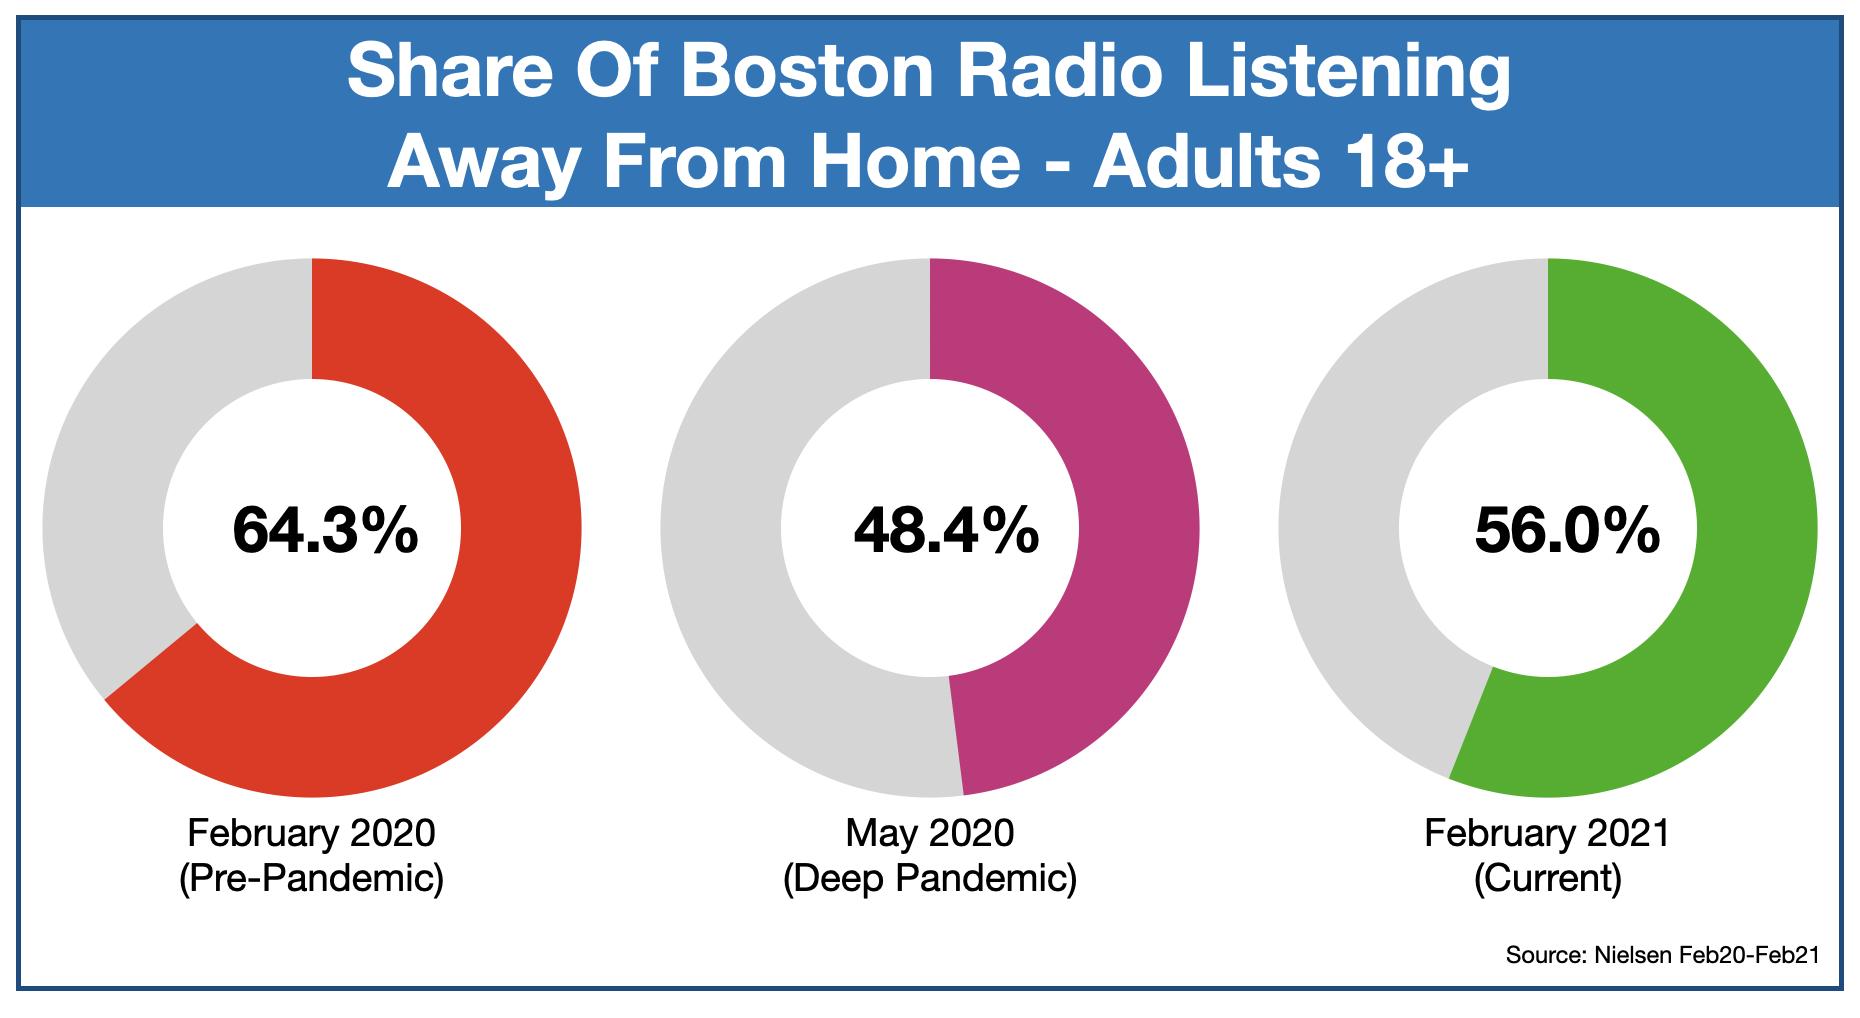 Advertising On Boston Radio: Listening Locations